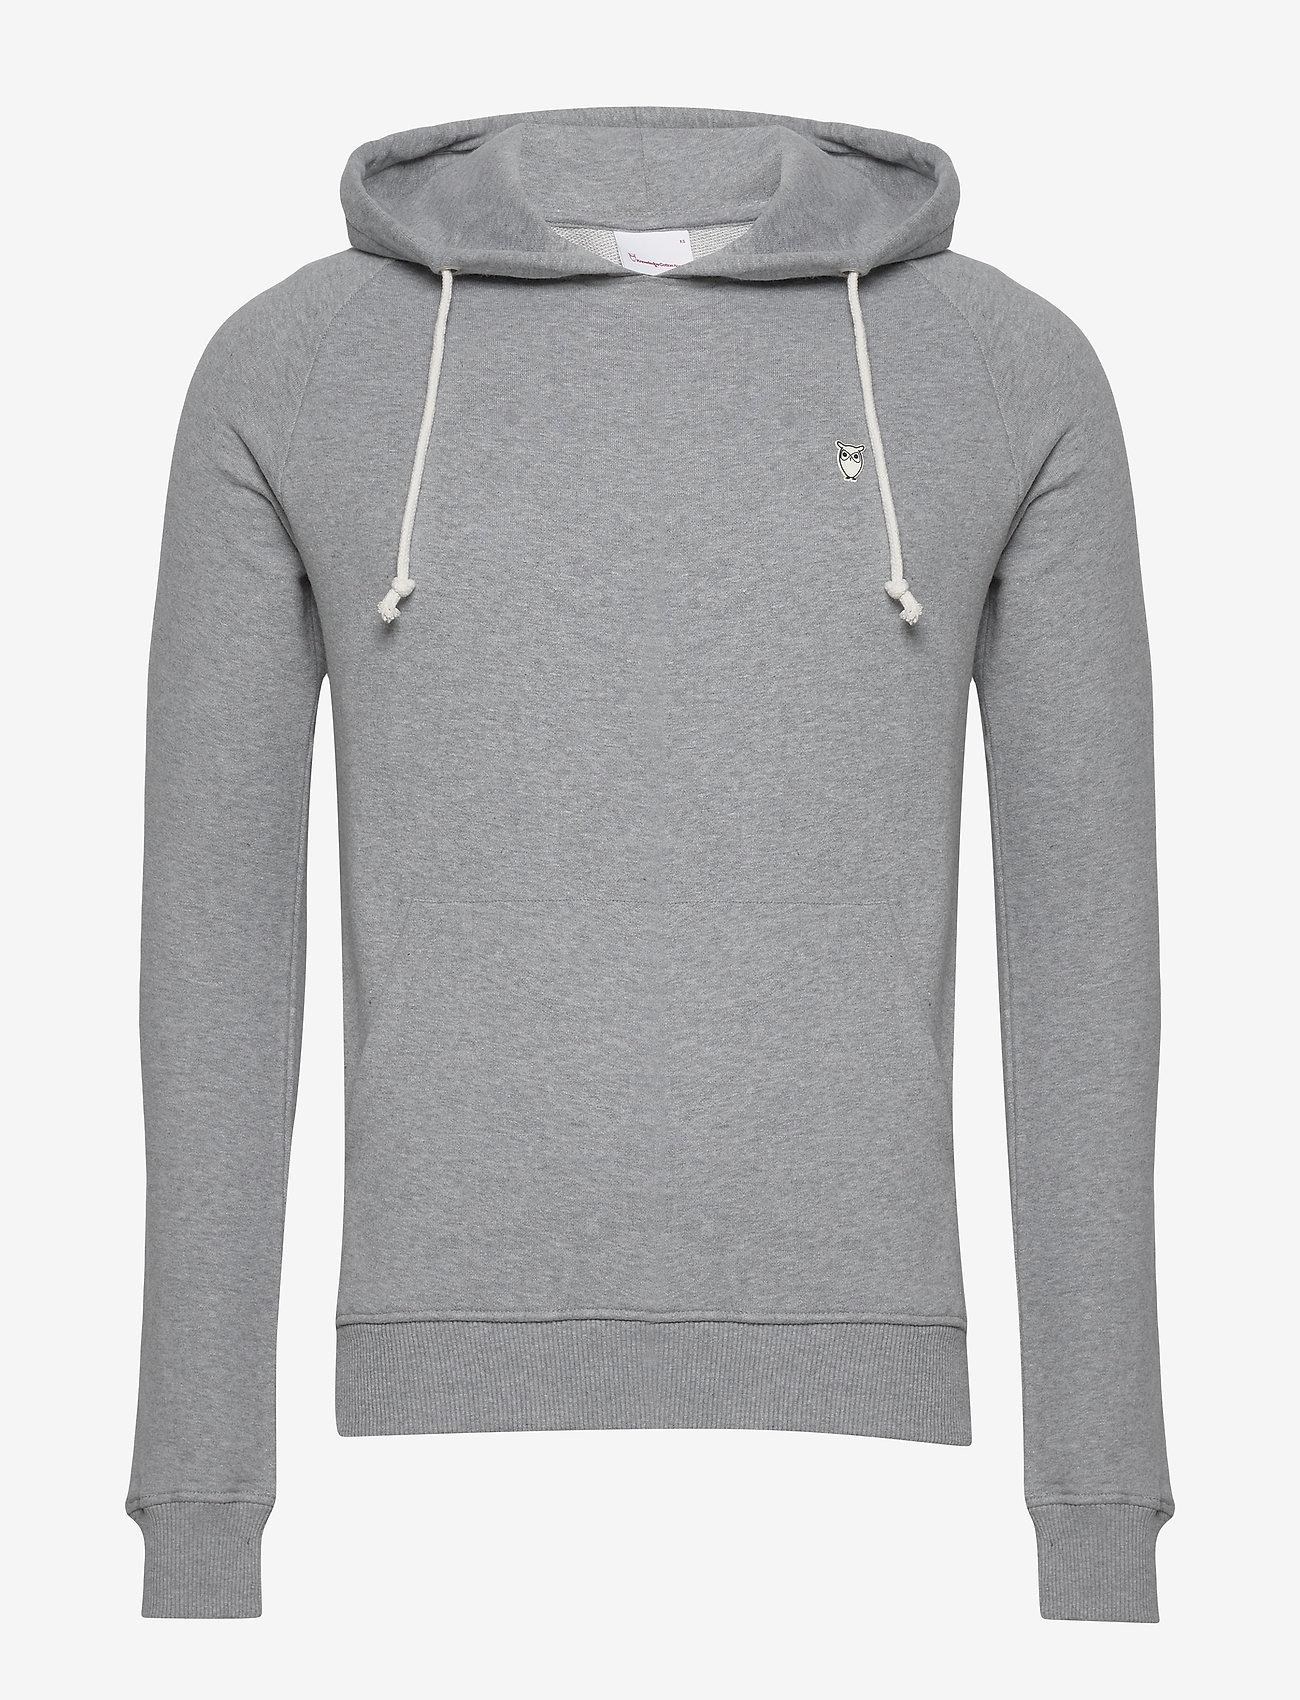 Knowledge Cotton Apparel - ELM small owl hoodie sweat - GOTS/V - basic sweatshirts - grey melange